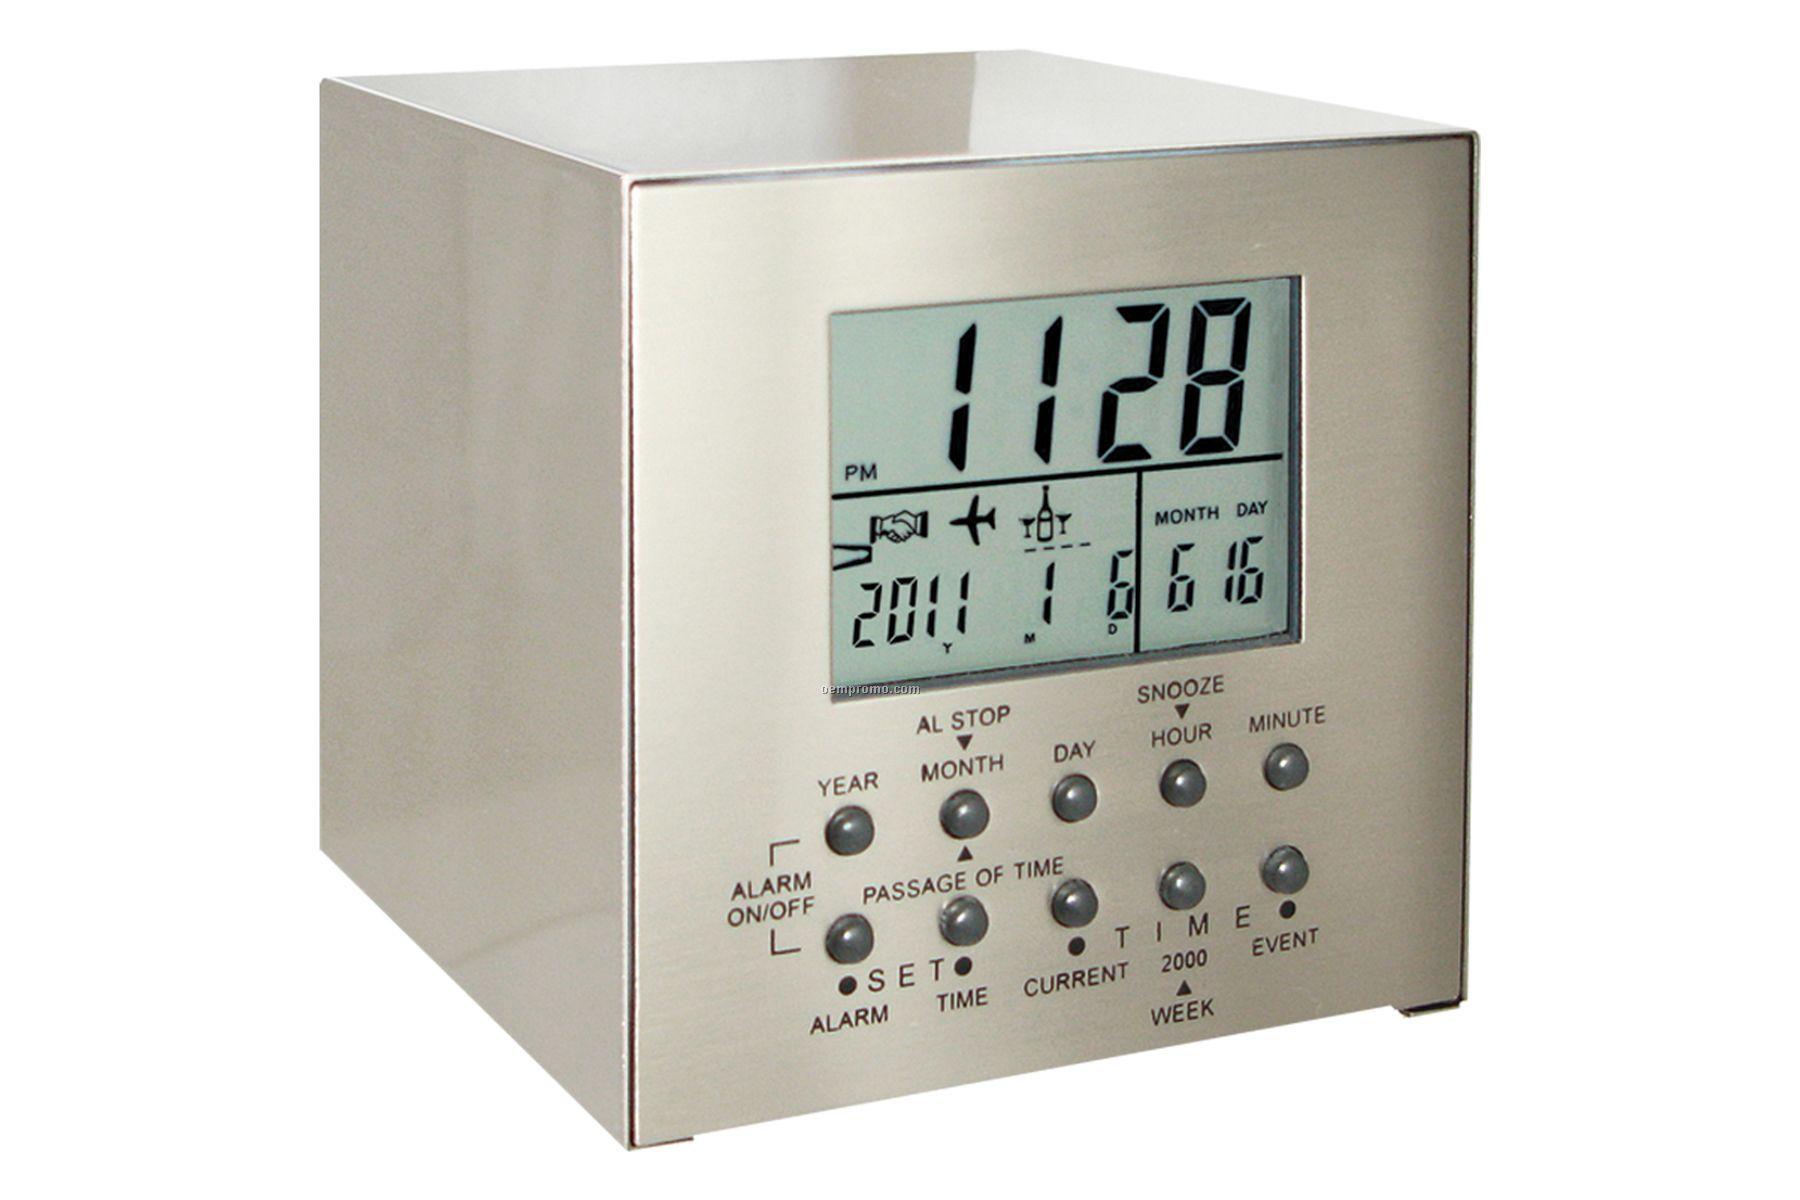 Cube 3-event Alarm Clock W/ Countdown Display